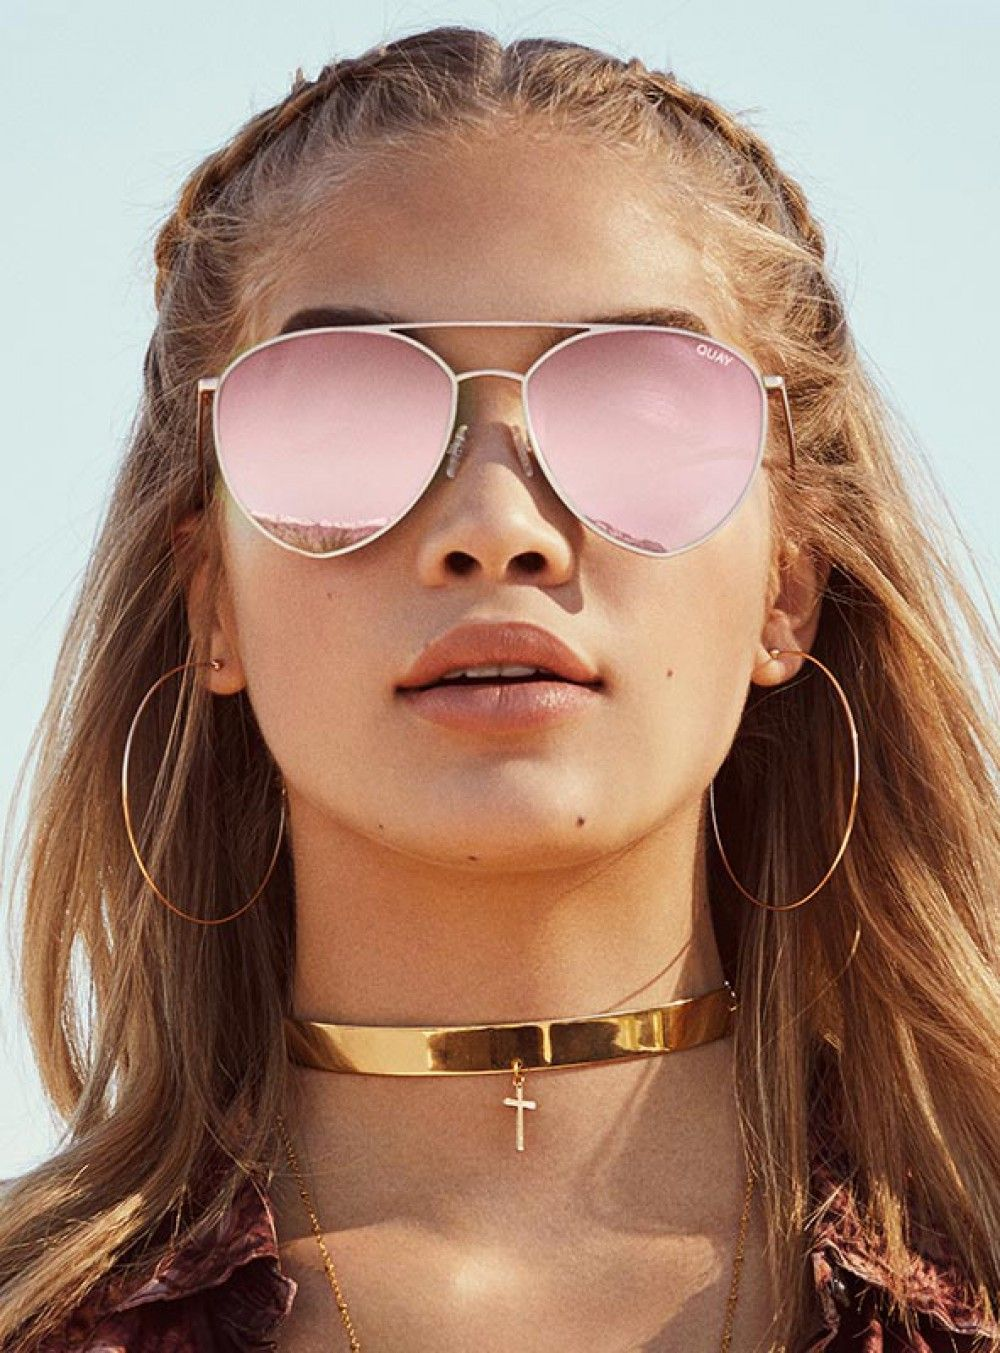 fa39aa3d74 Quay Indio Sunglasses Gold Pink Mirror